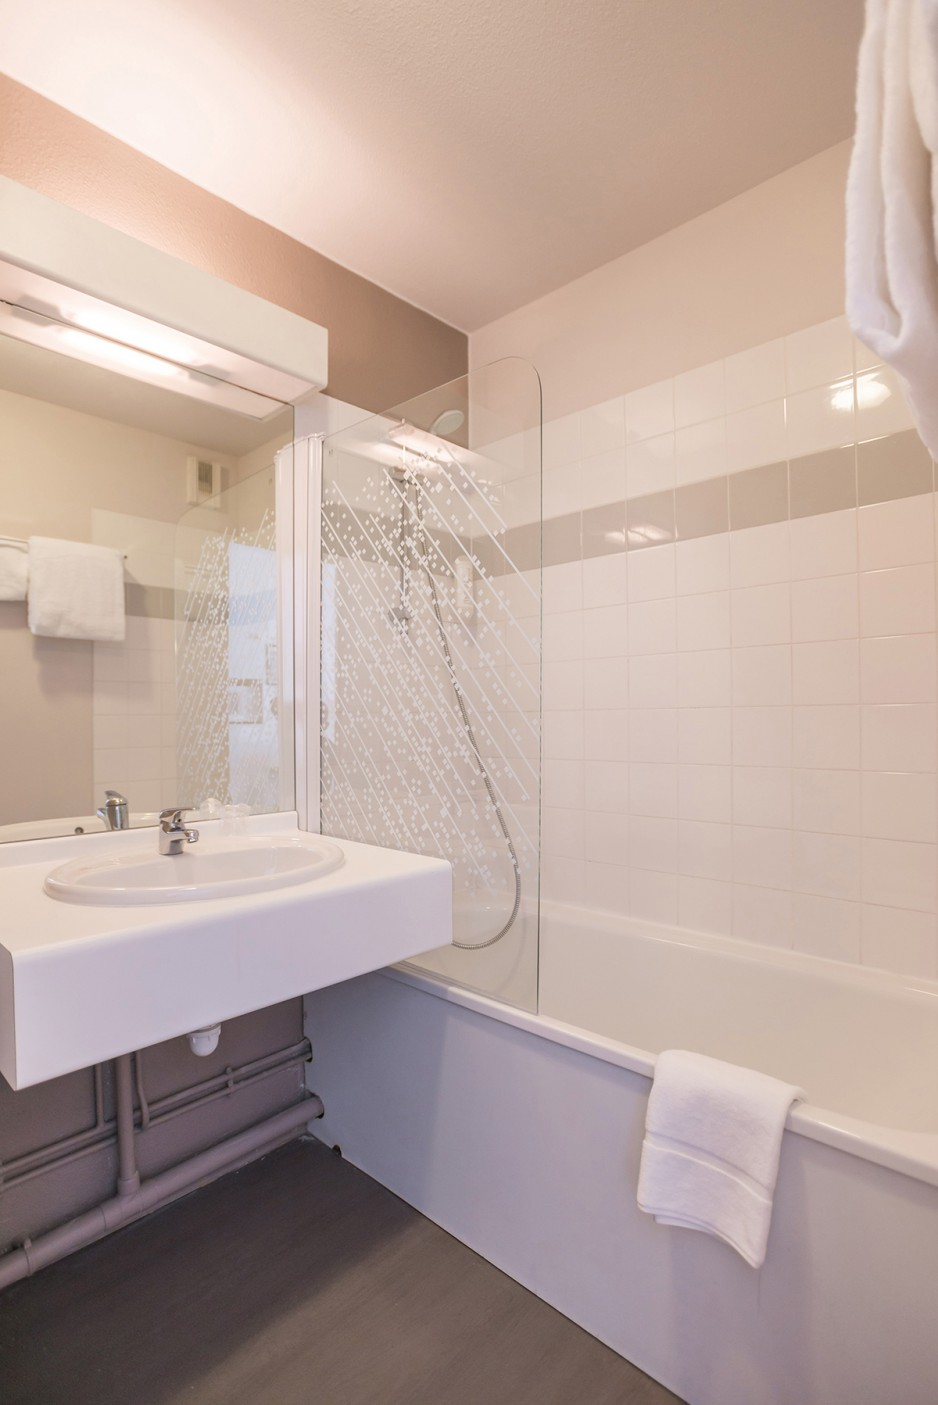 H tel journ e bobigny appart 39 city paris bobigny - Reserver une chambre d hotel pour une apres midi ...